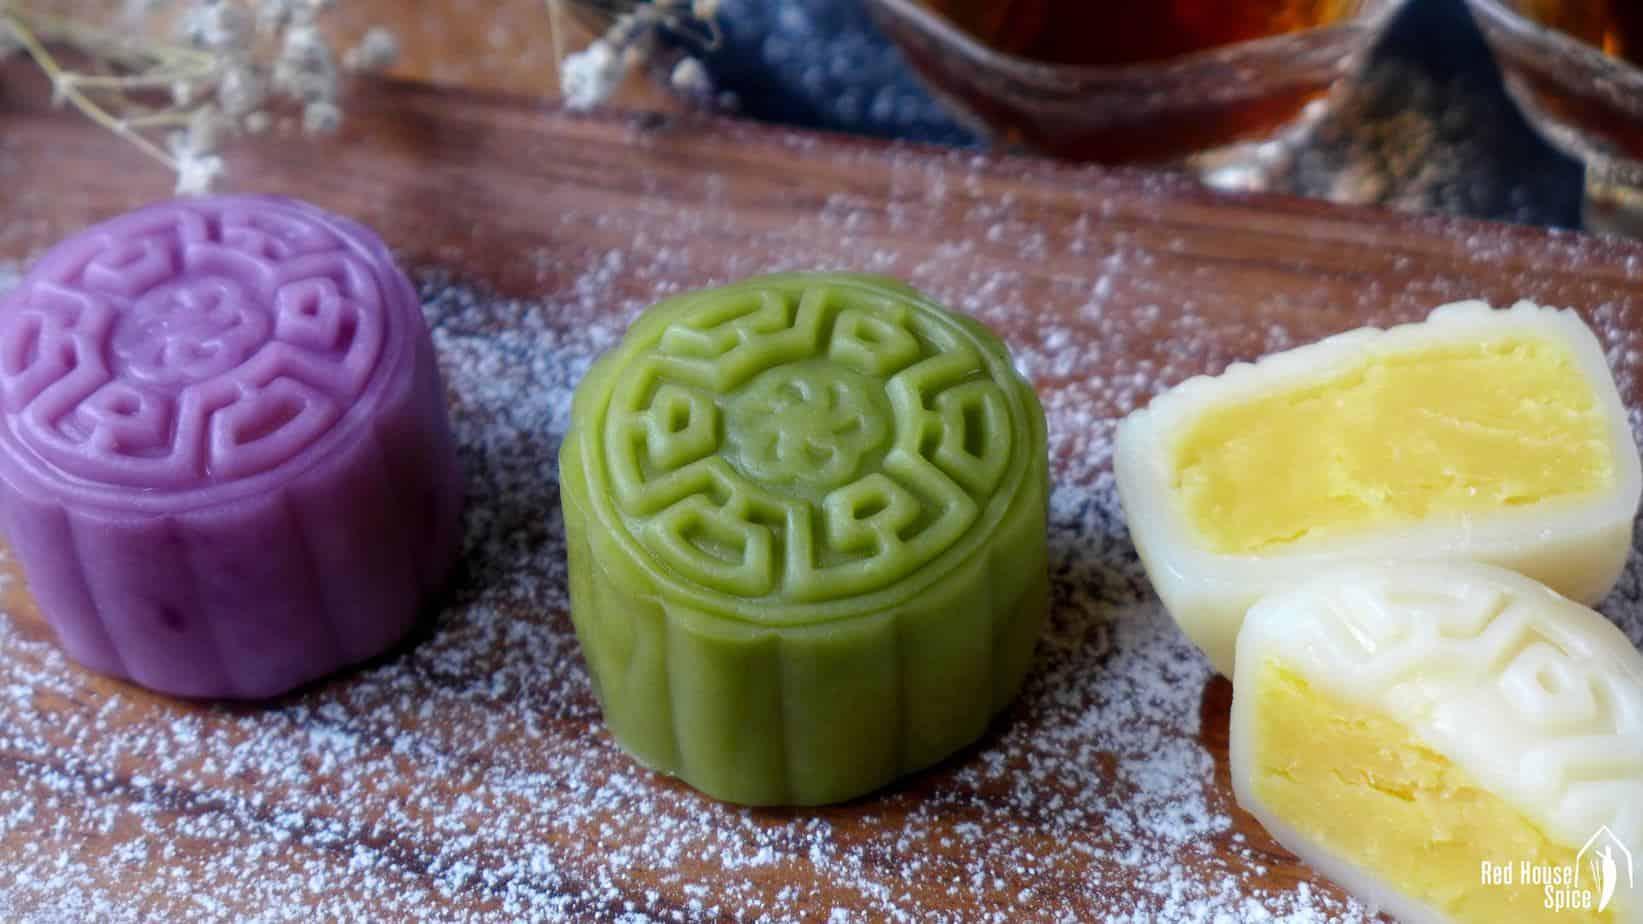 Snow skin mooncake with custard filling (冰皮月饼)